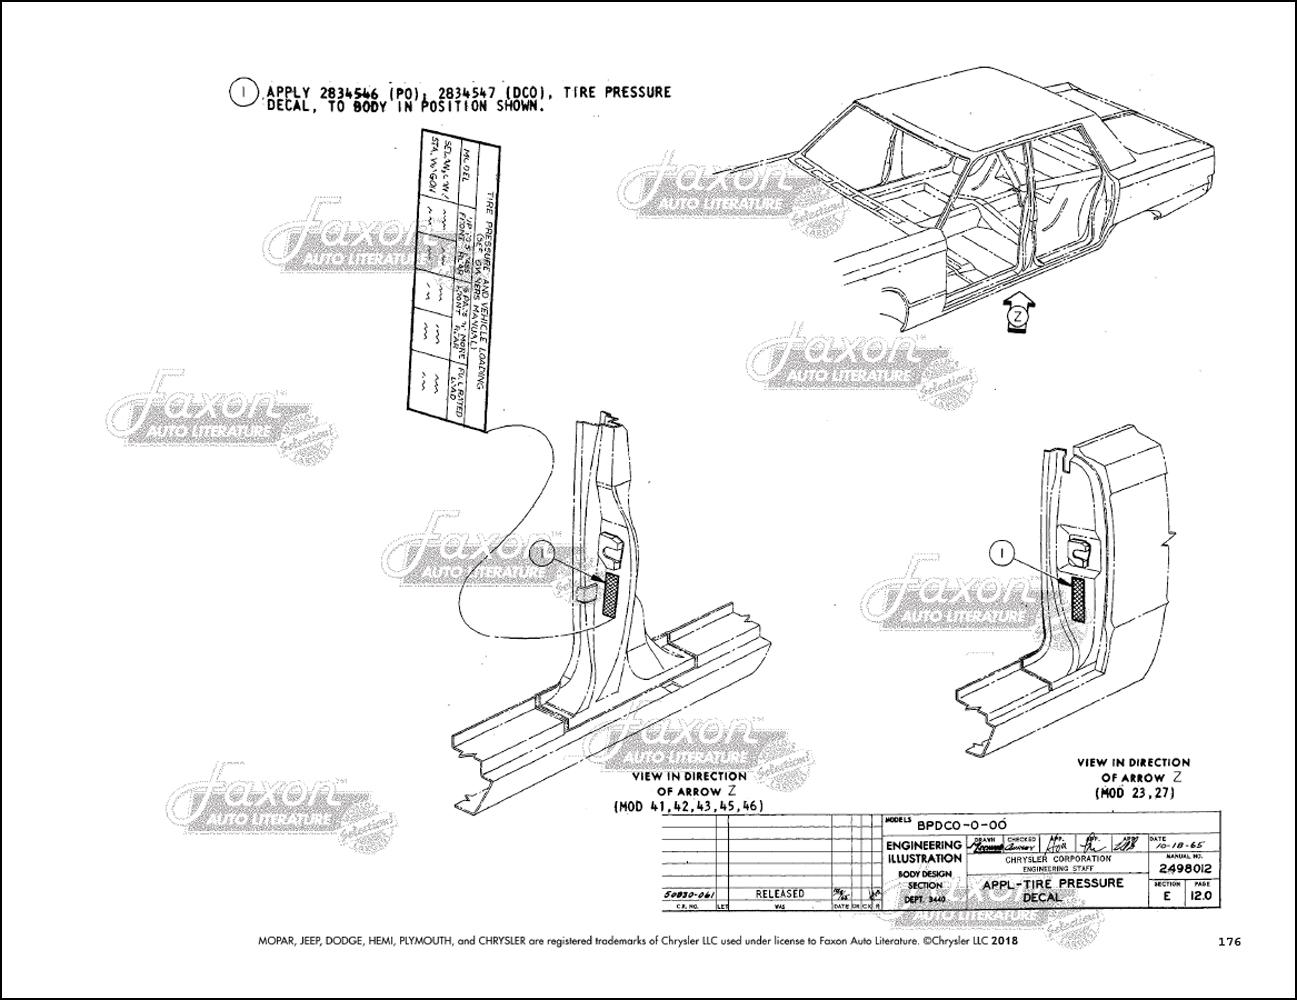 1966 Chrysler Body & Electrical Assembly Manual Reprint